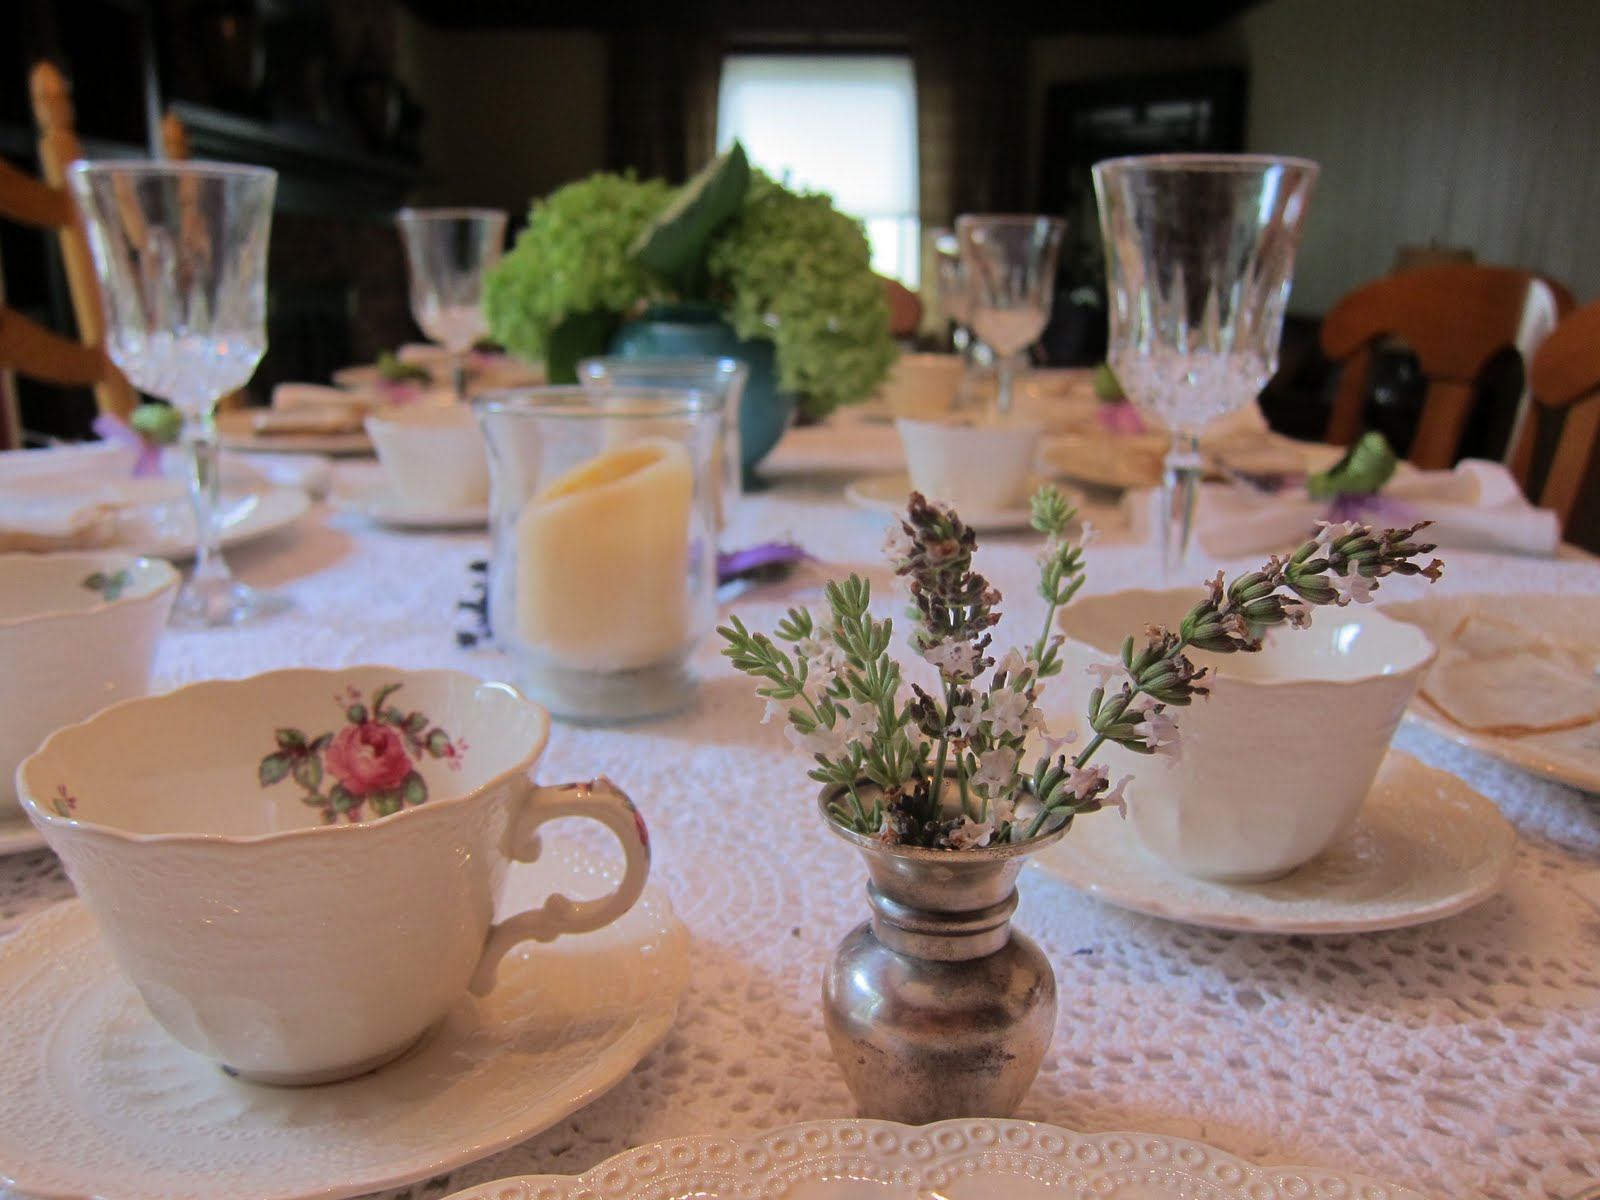 tea table settings tables - photo #43